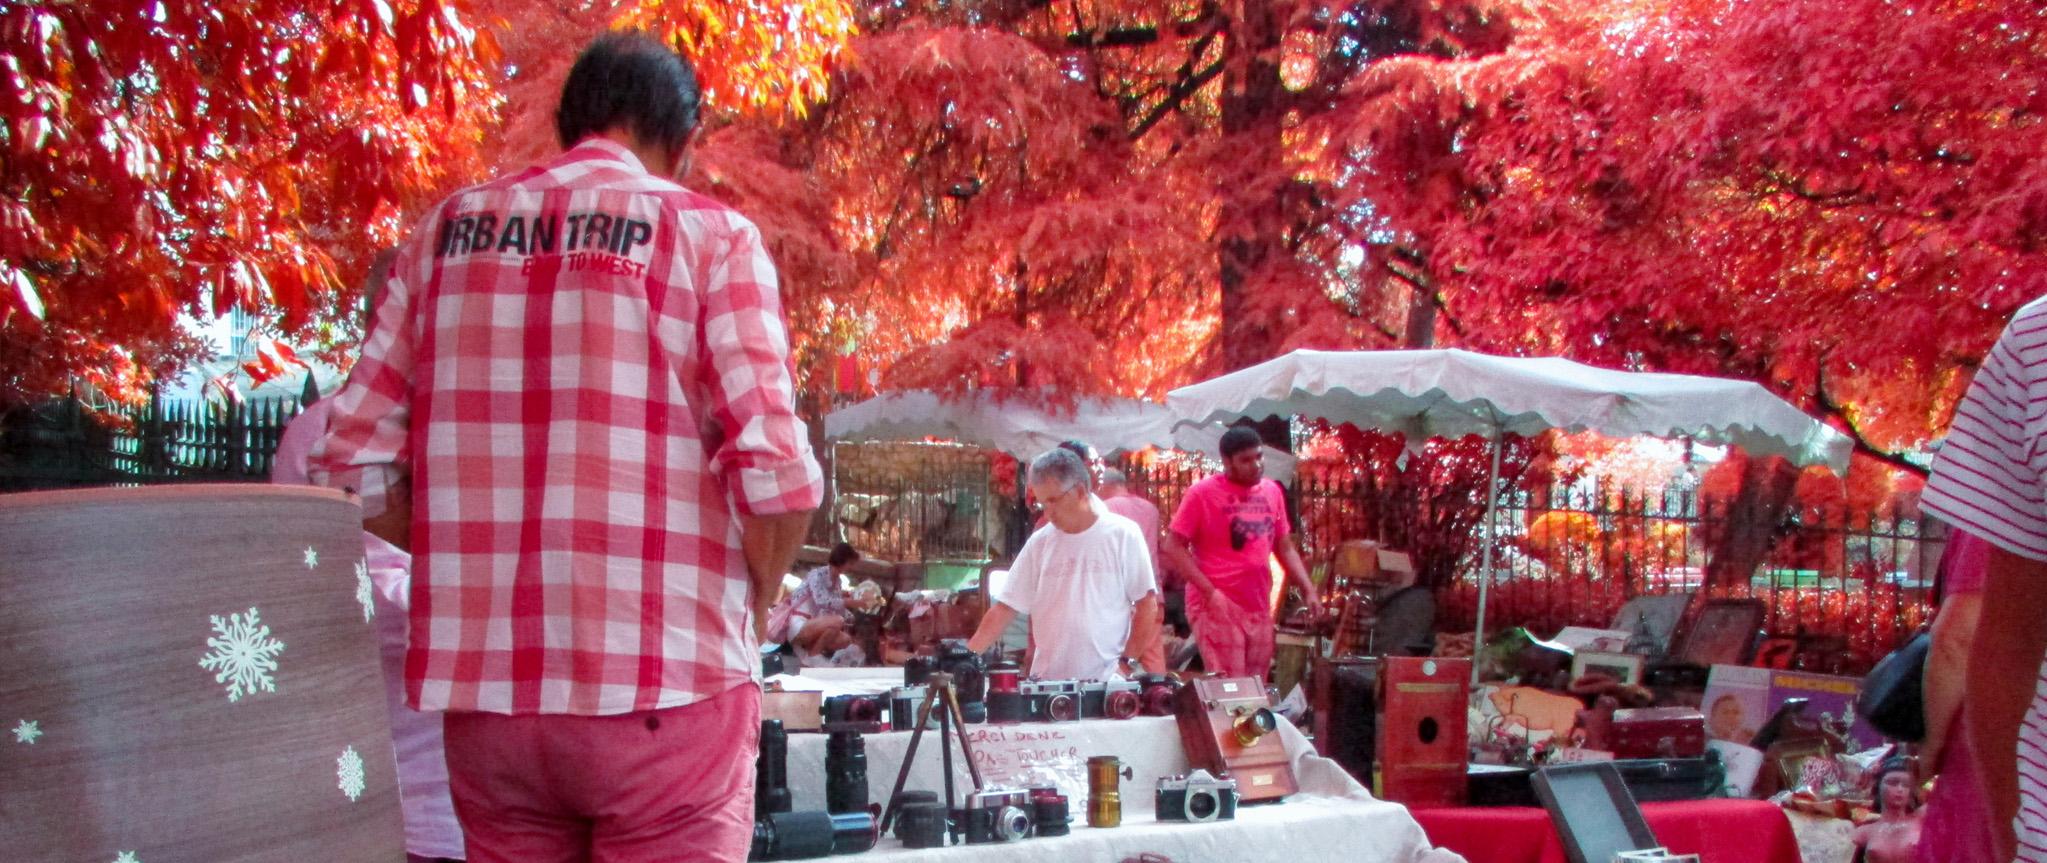 Arles en Infrarouge avec le filtre IRChrome